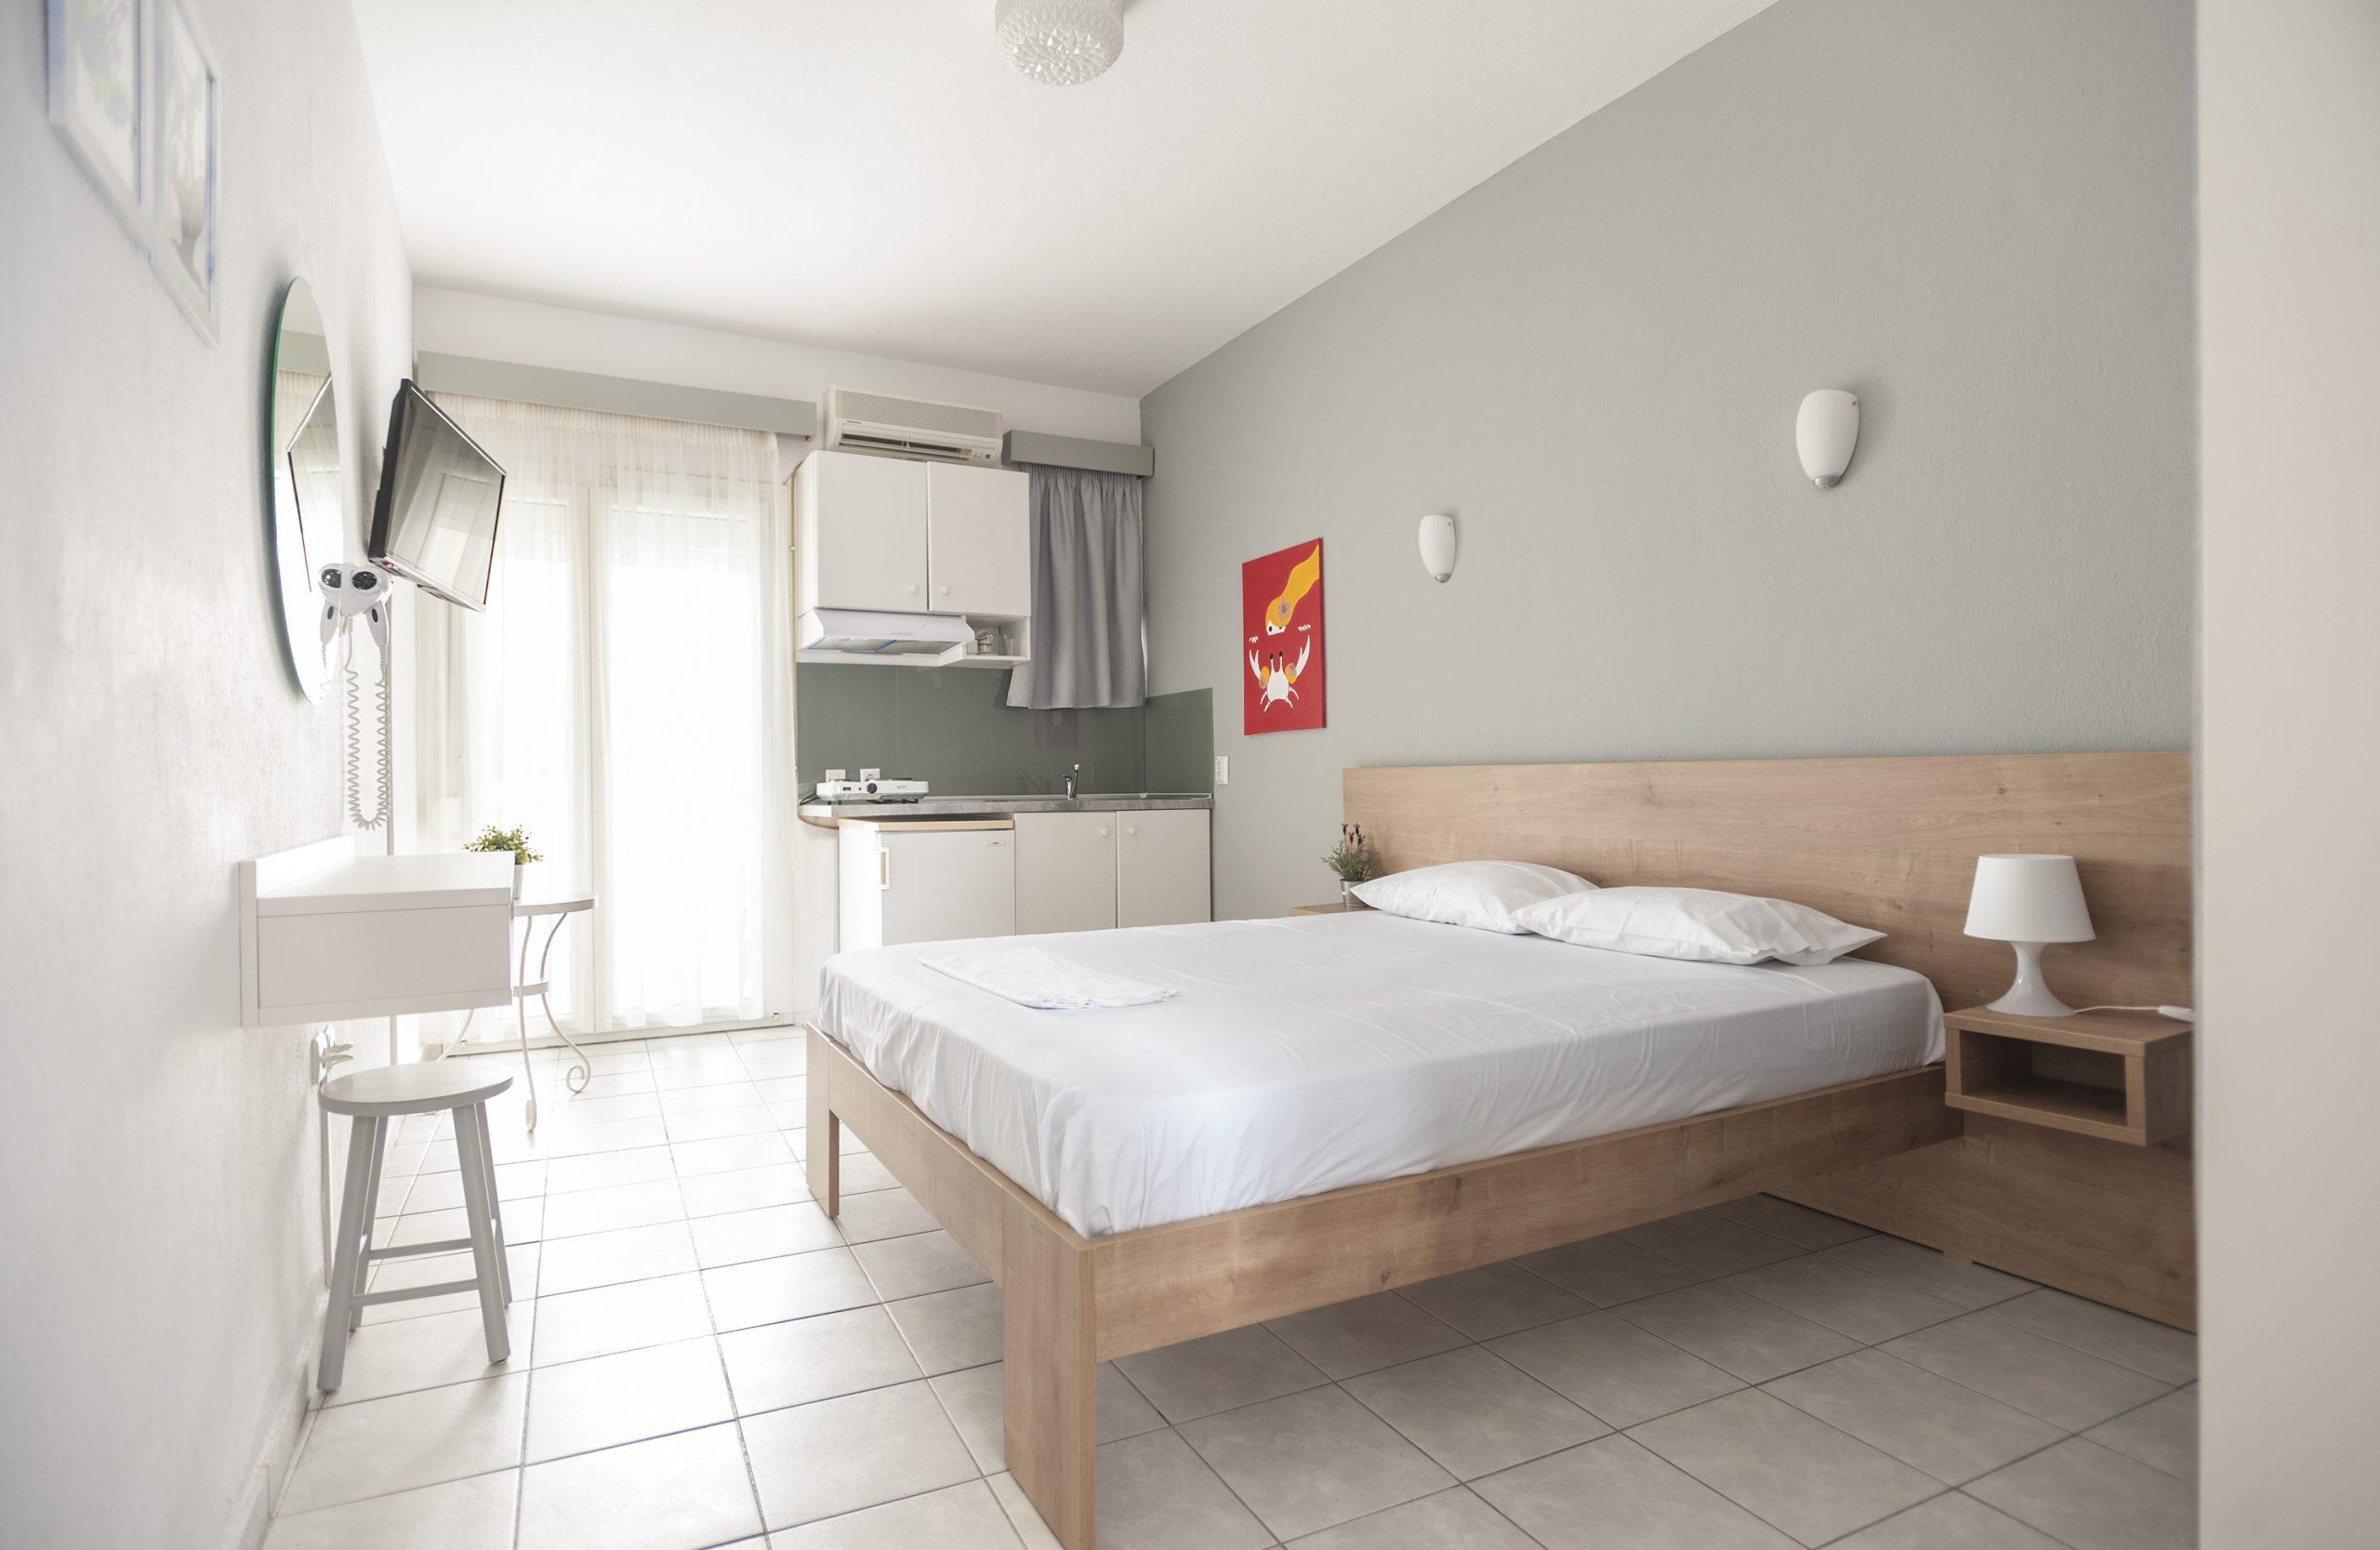 Afkos_rooms_005